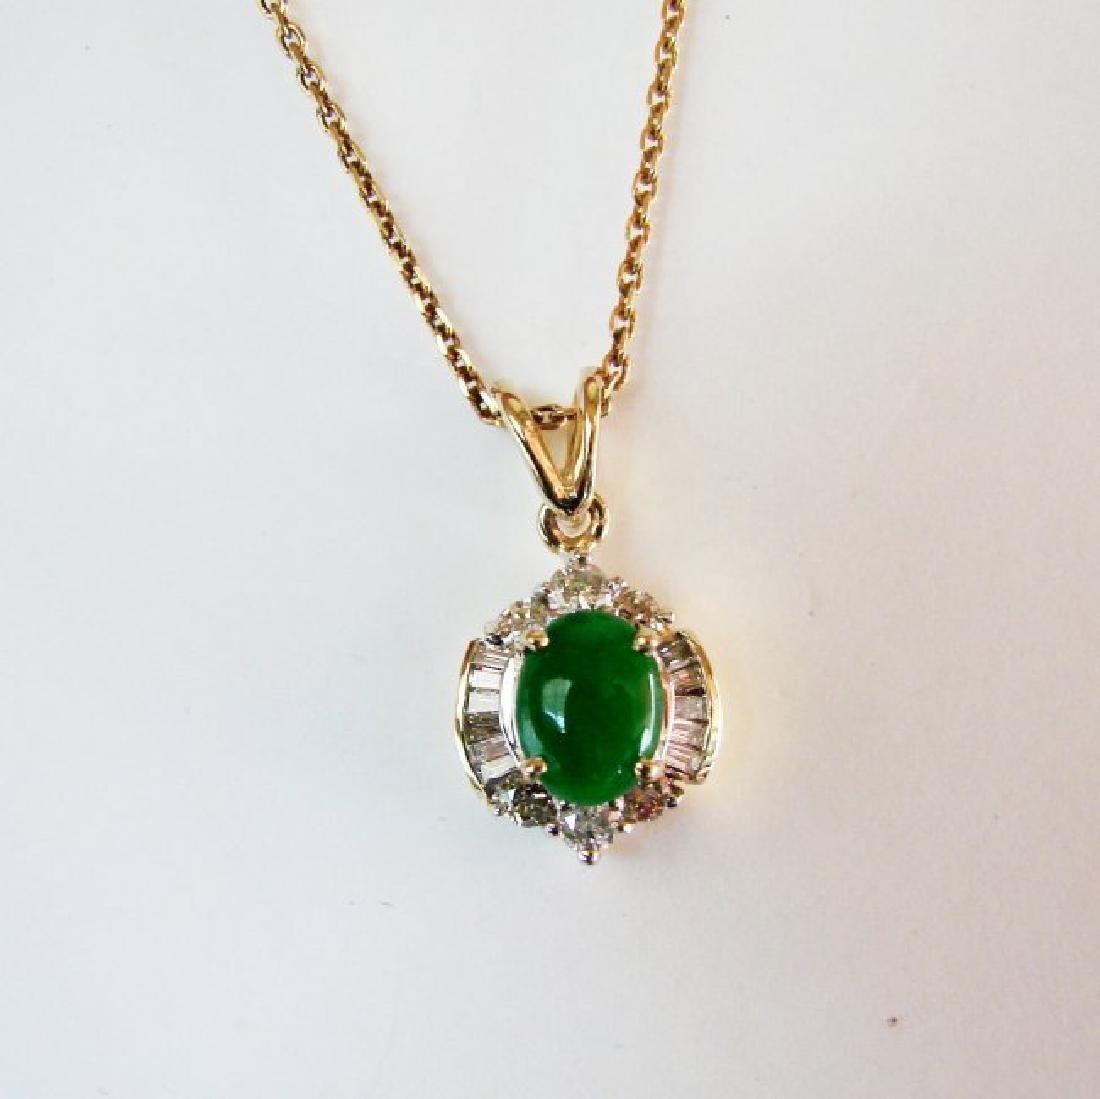 Pendant Imperial Jade/Diamond 1.89Ct 14k Y/g